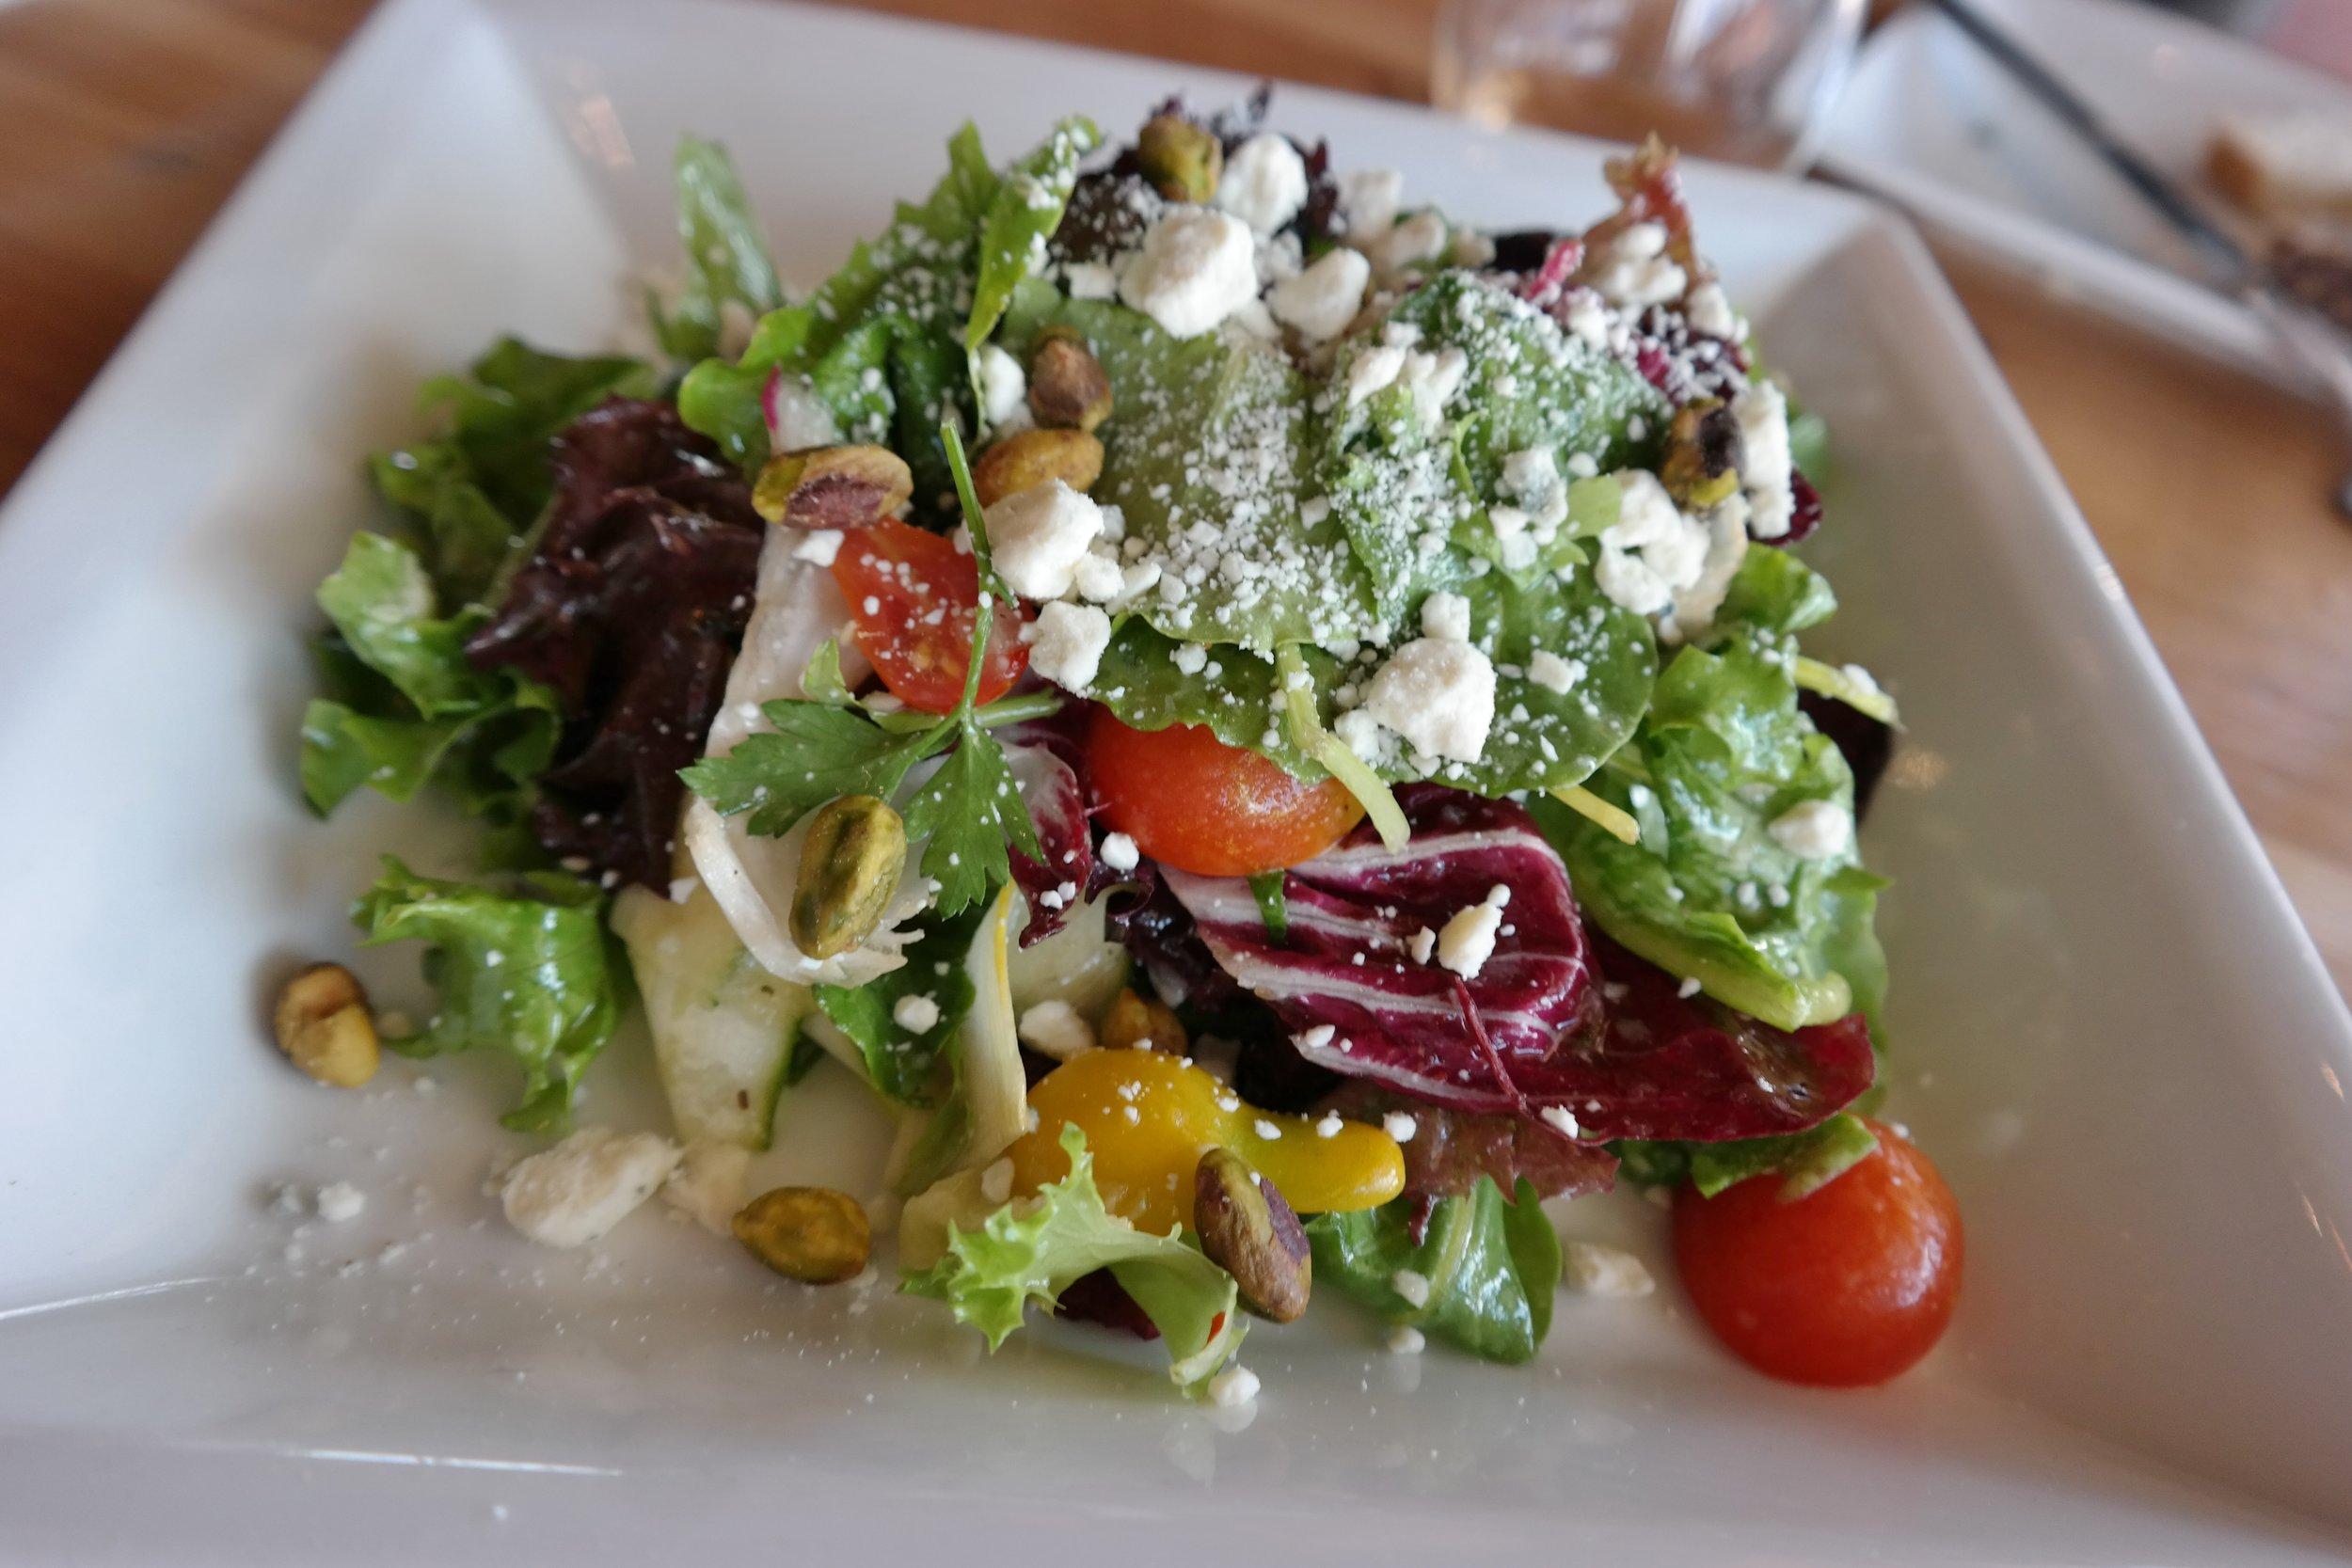 Seasonal salad at Merkin Osteria